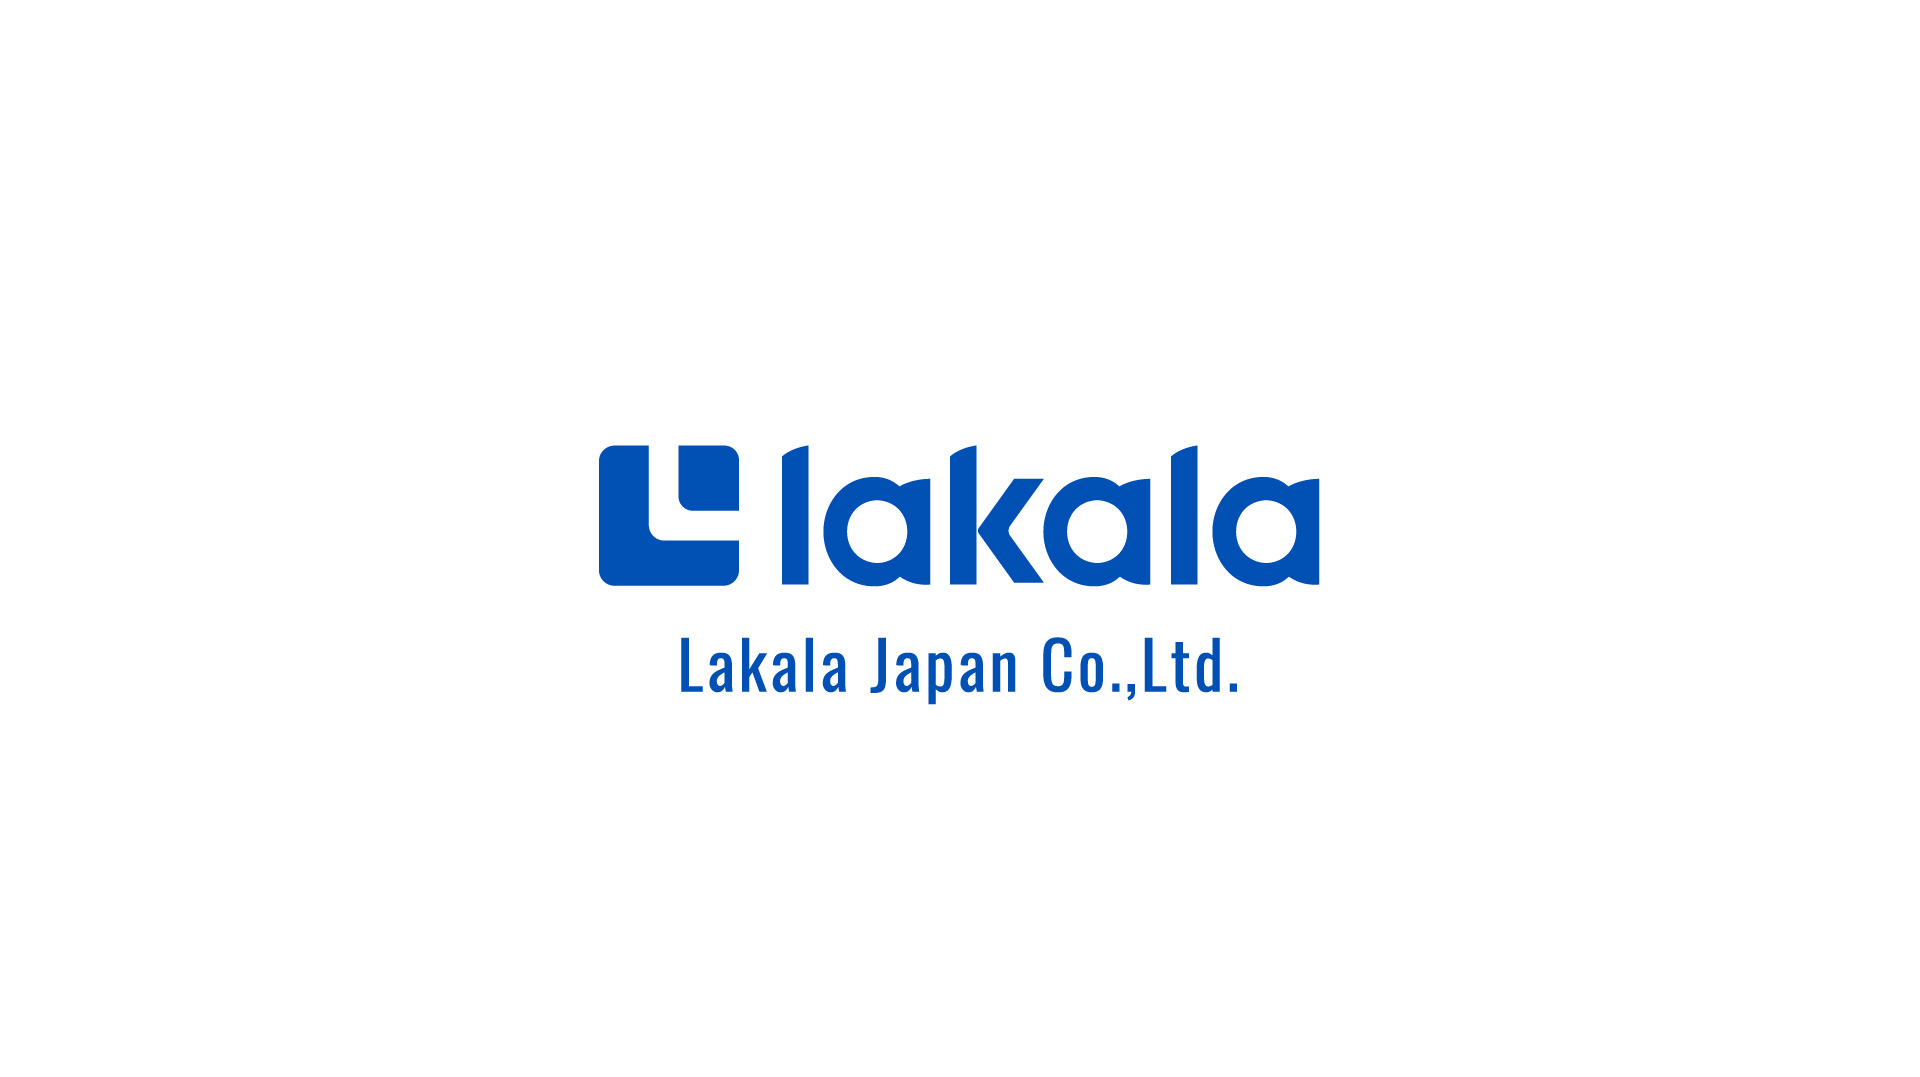 Lakala Japan Co.,Ltd